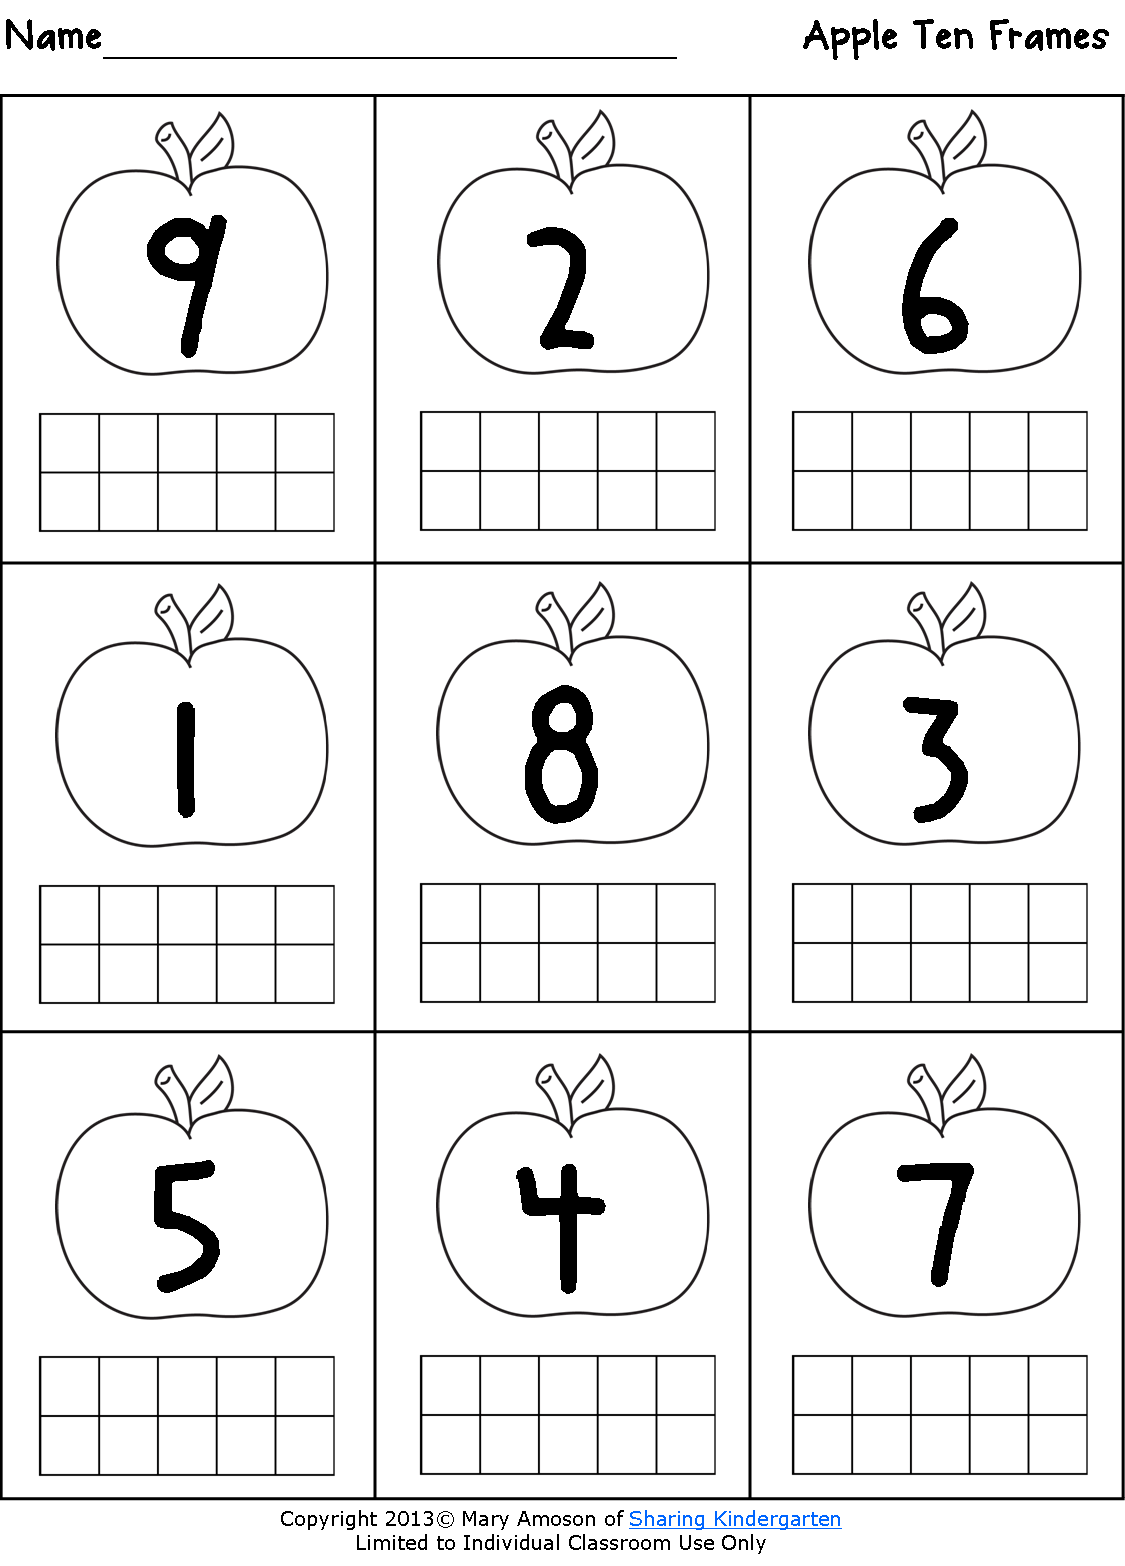 Homework Clipart Kindergarten Homework Homework